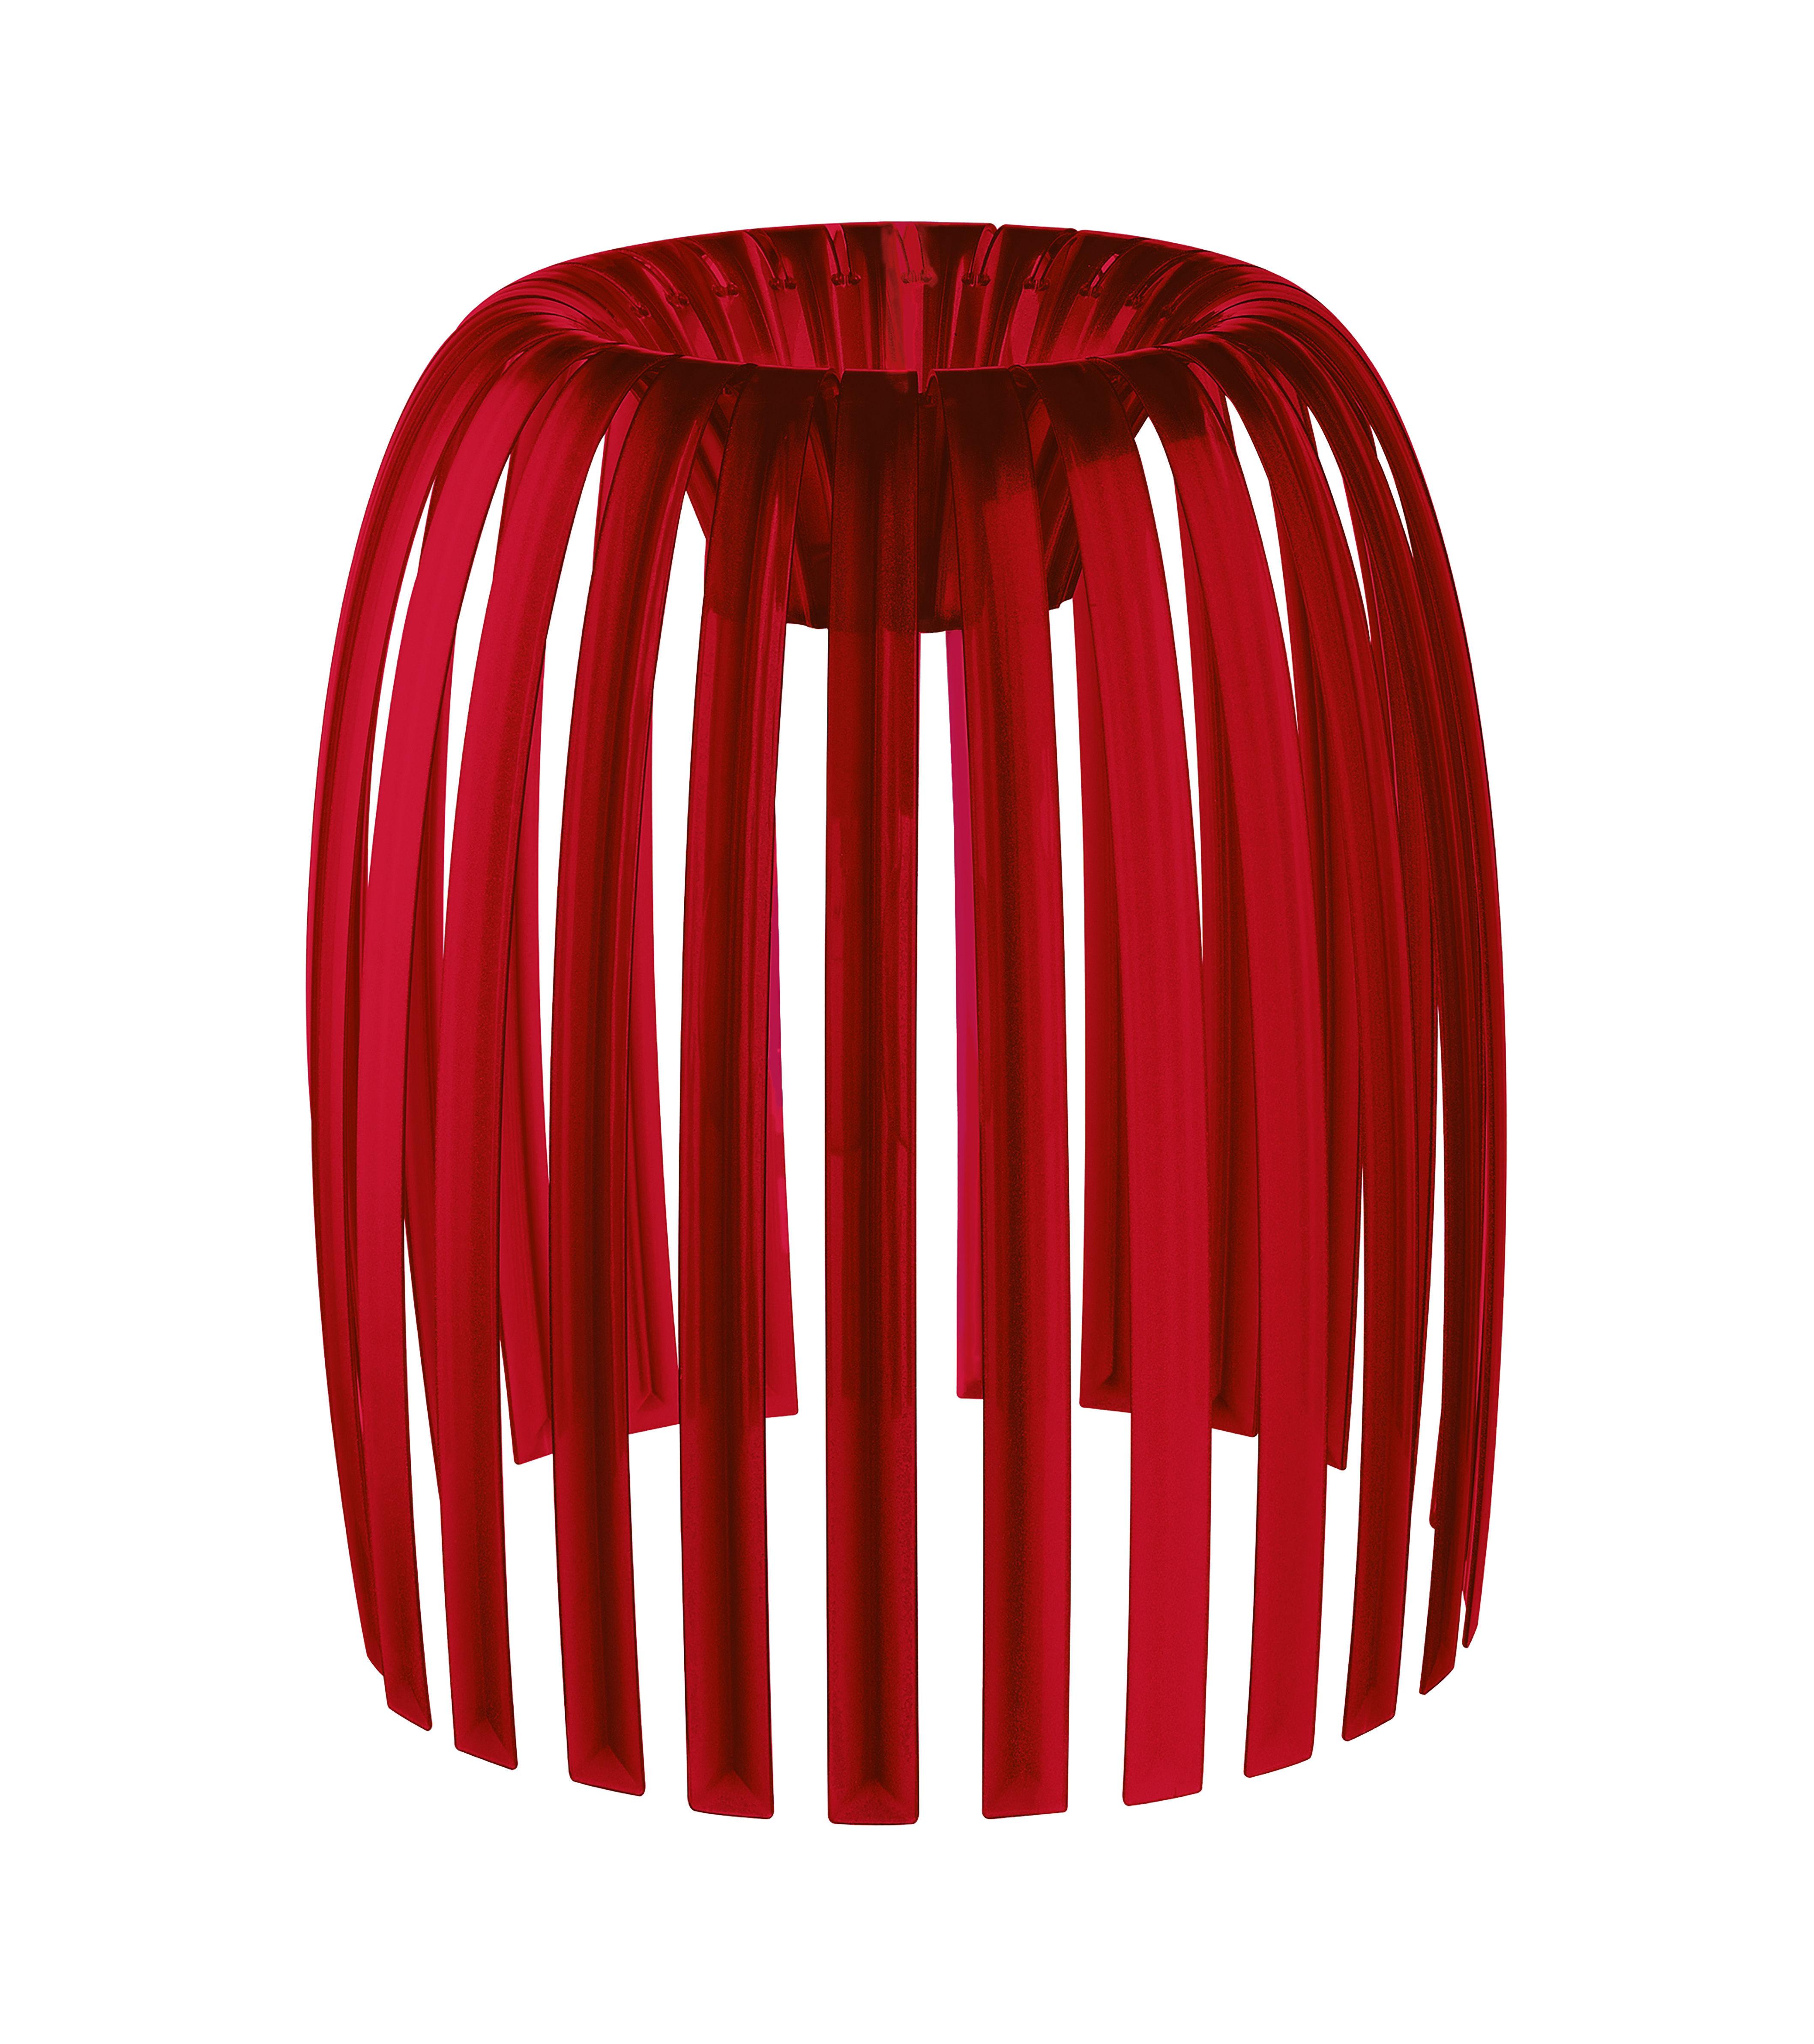 Luminaire - Suspensions - Abat-jour Josephine Medium / Ø 31 x H 34 cm - Koziol - Rouge transparent - Polyéthylène